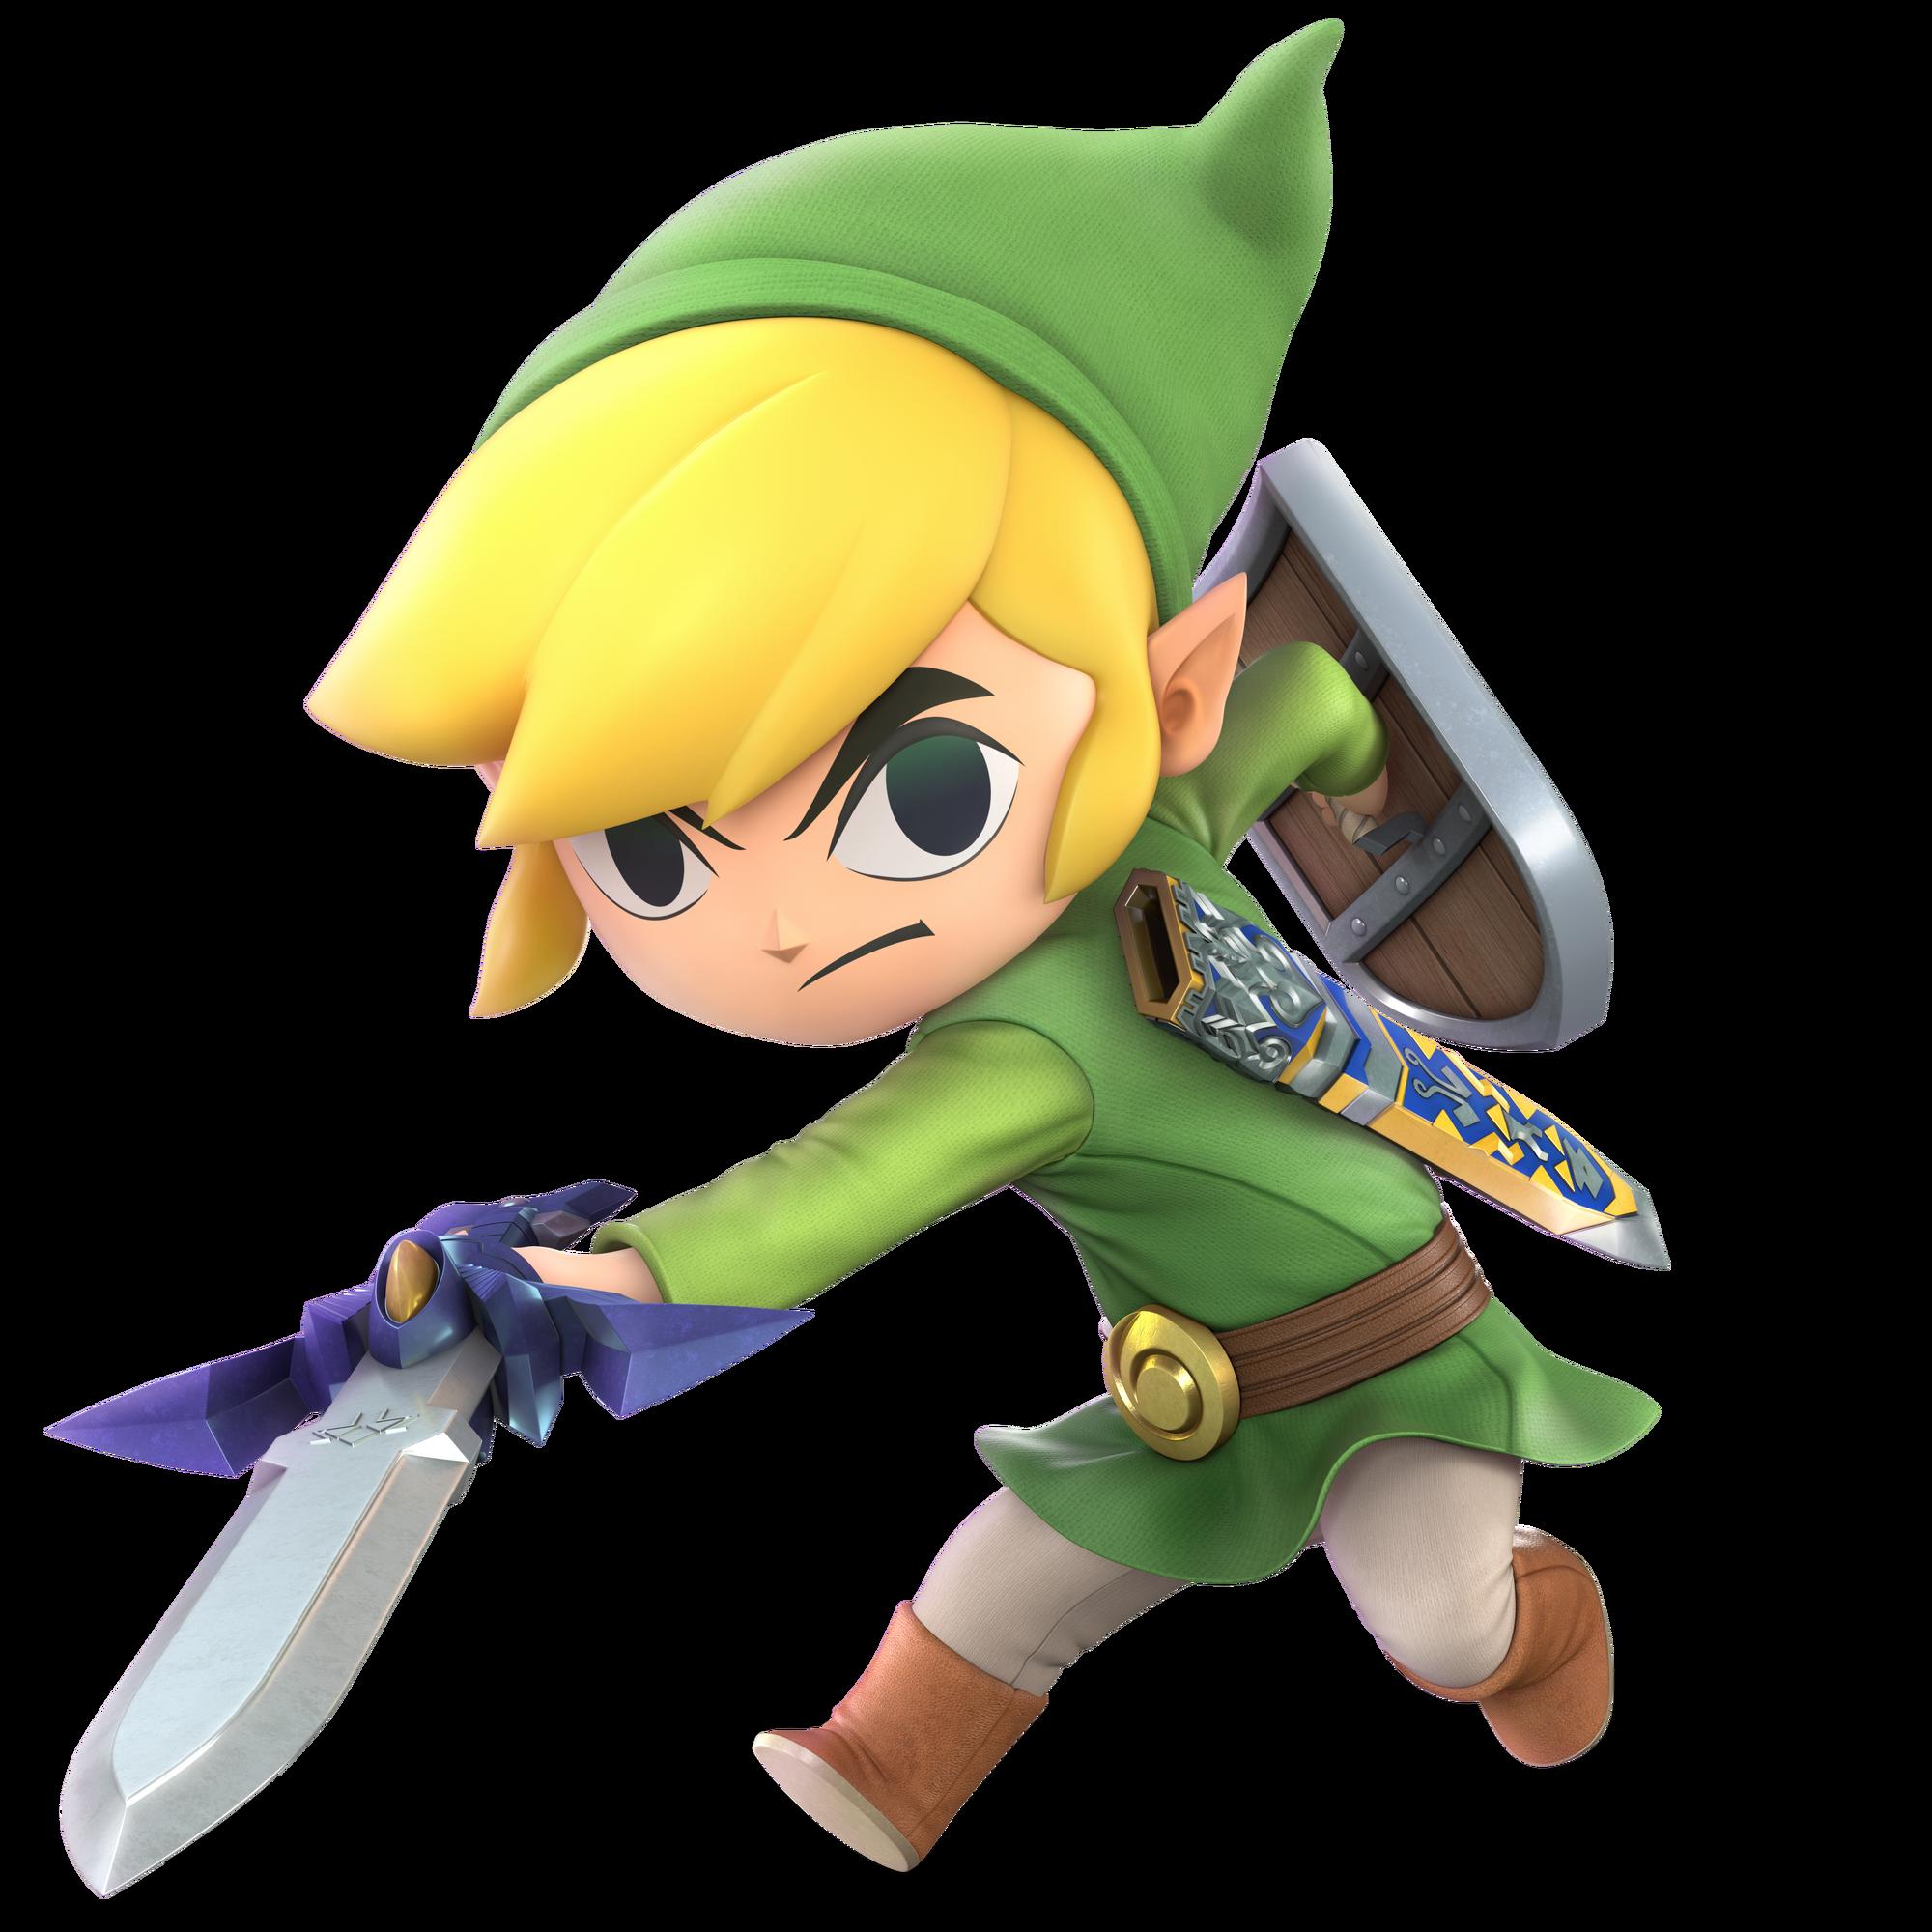 Toon Link | Nintendo | FANDOM powered by Wikia